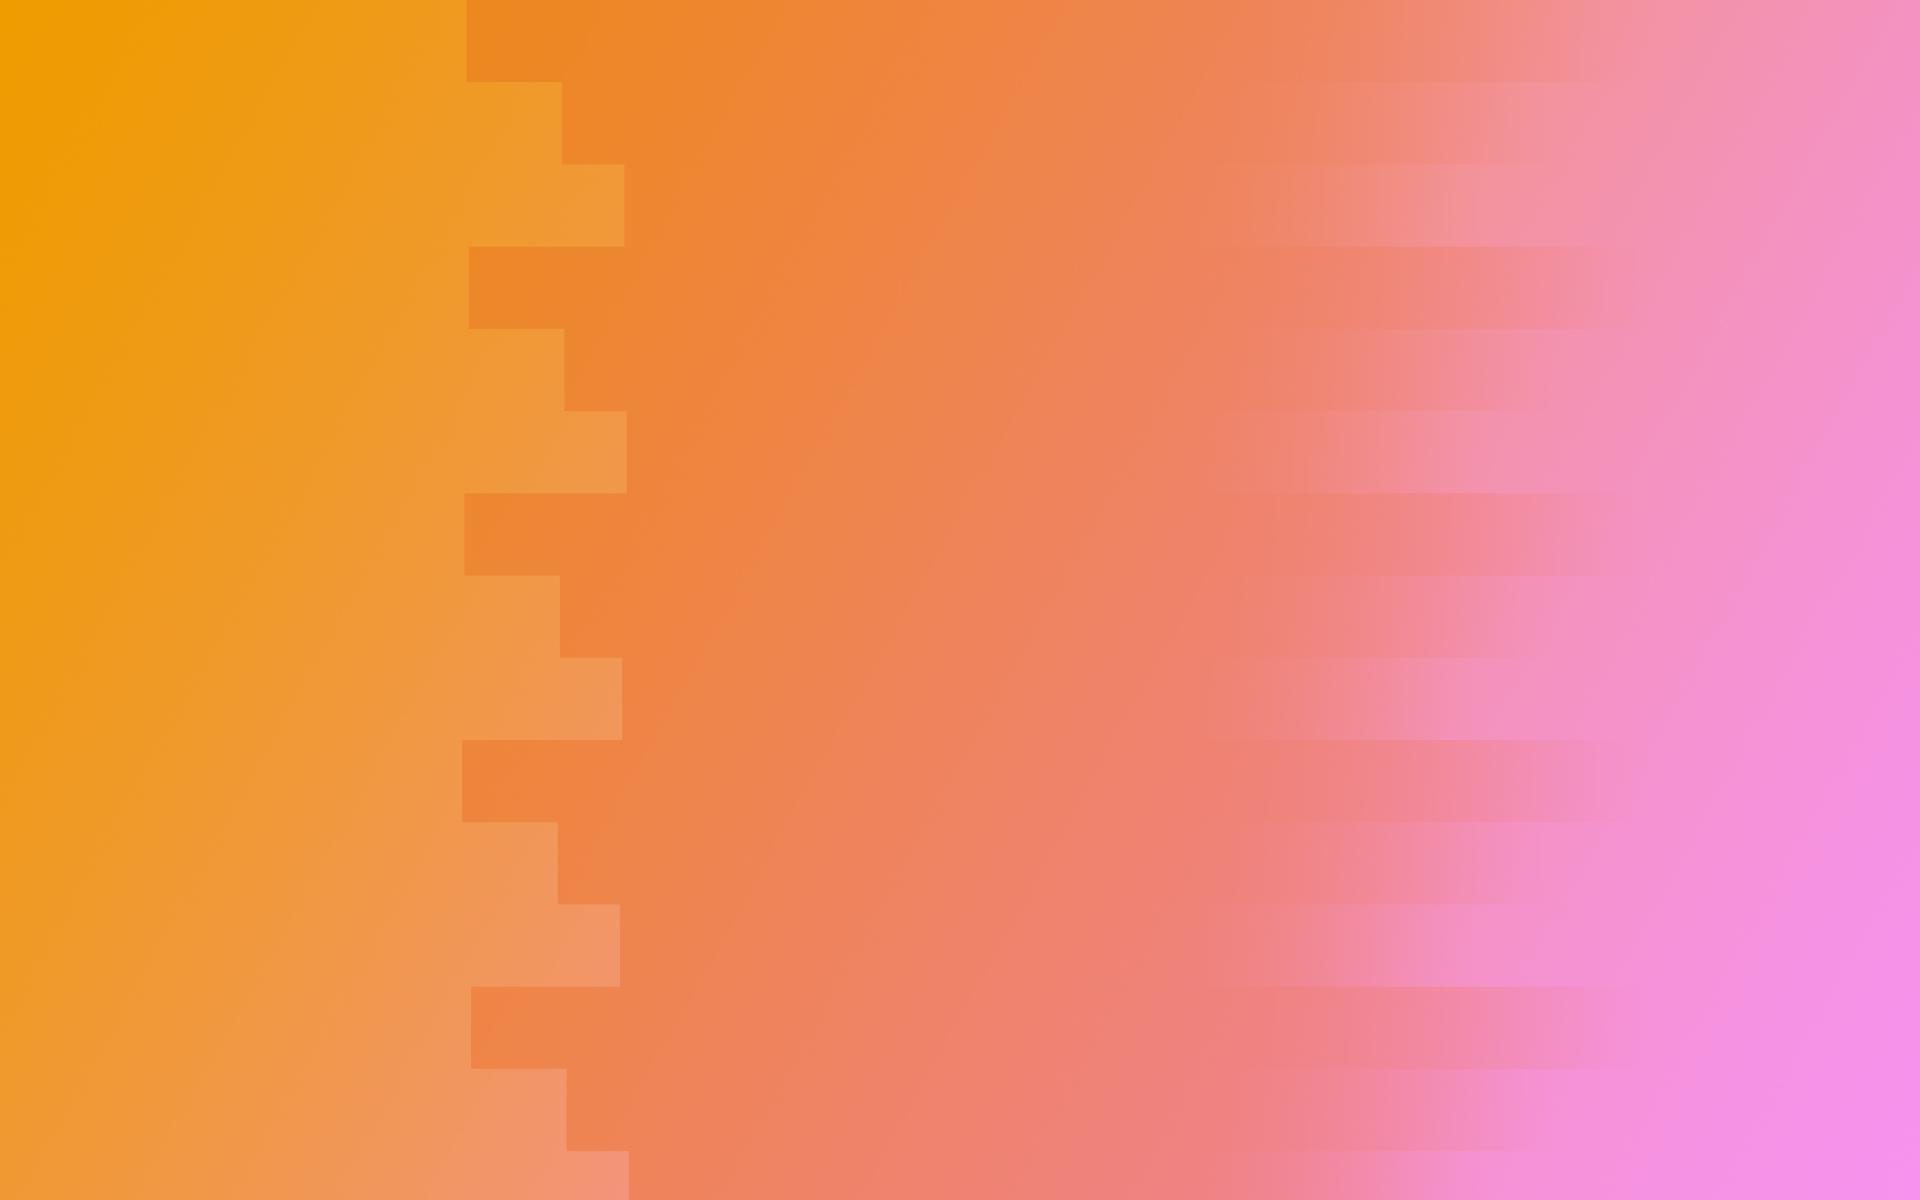 1920x1200 Orange Gradient Abstract 1200P Wallpaper, HD ...